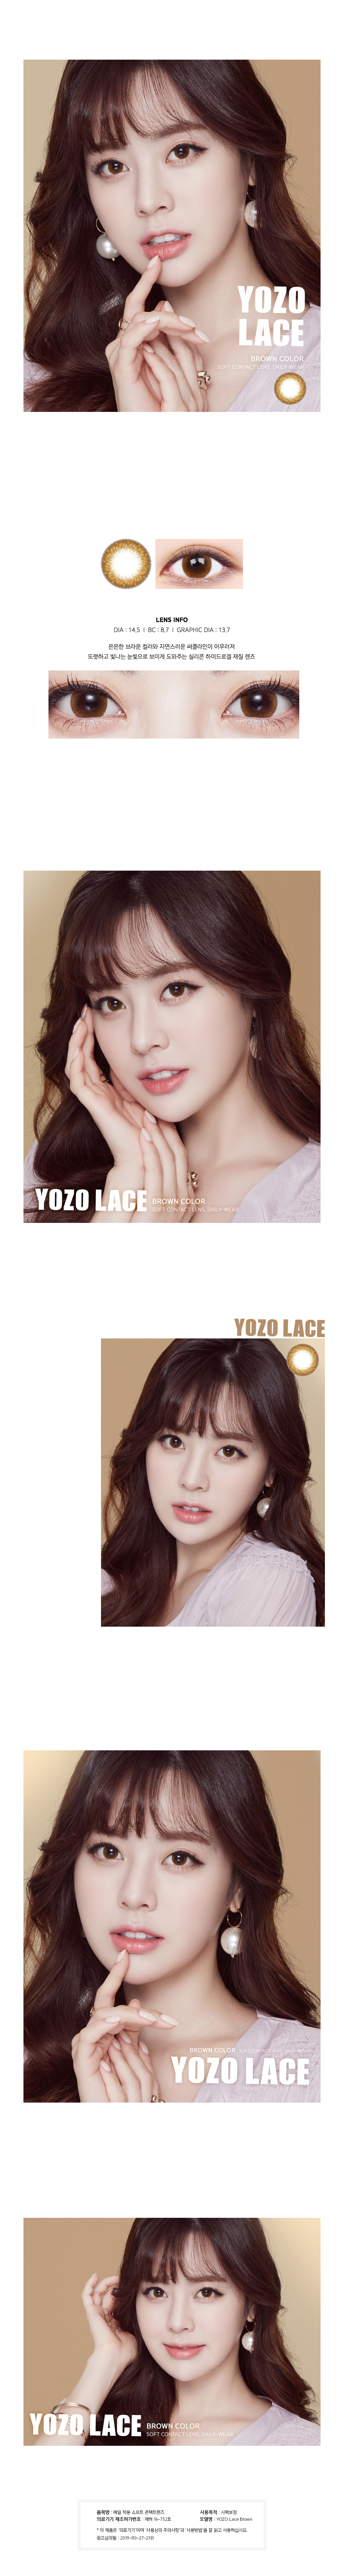 yozolacebrown.jpg